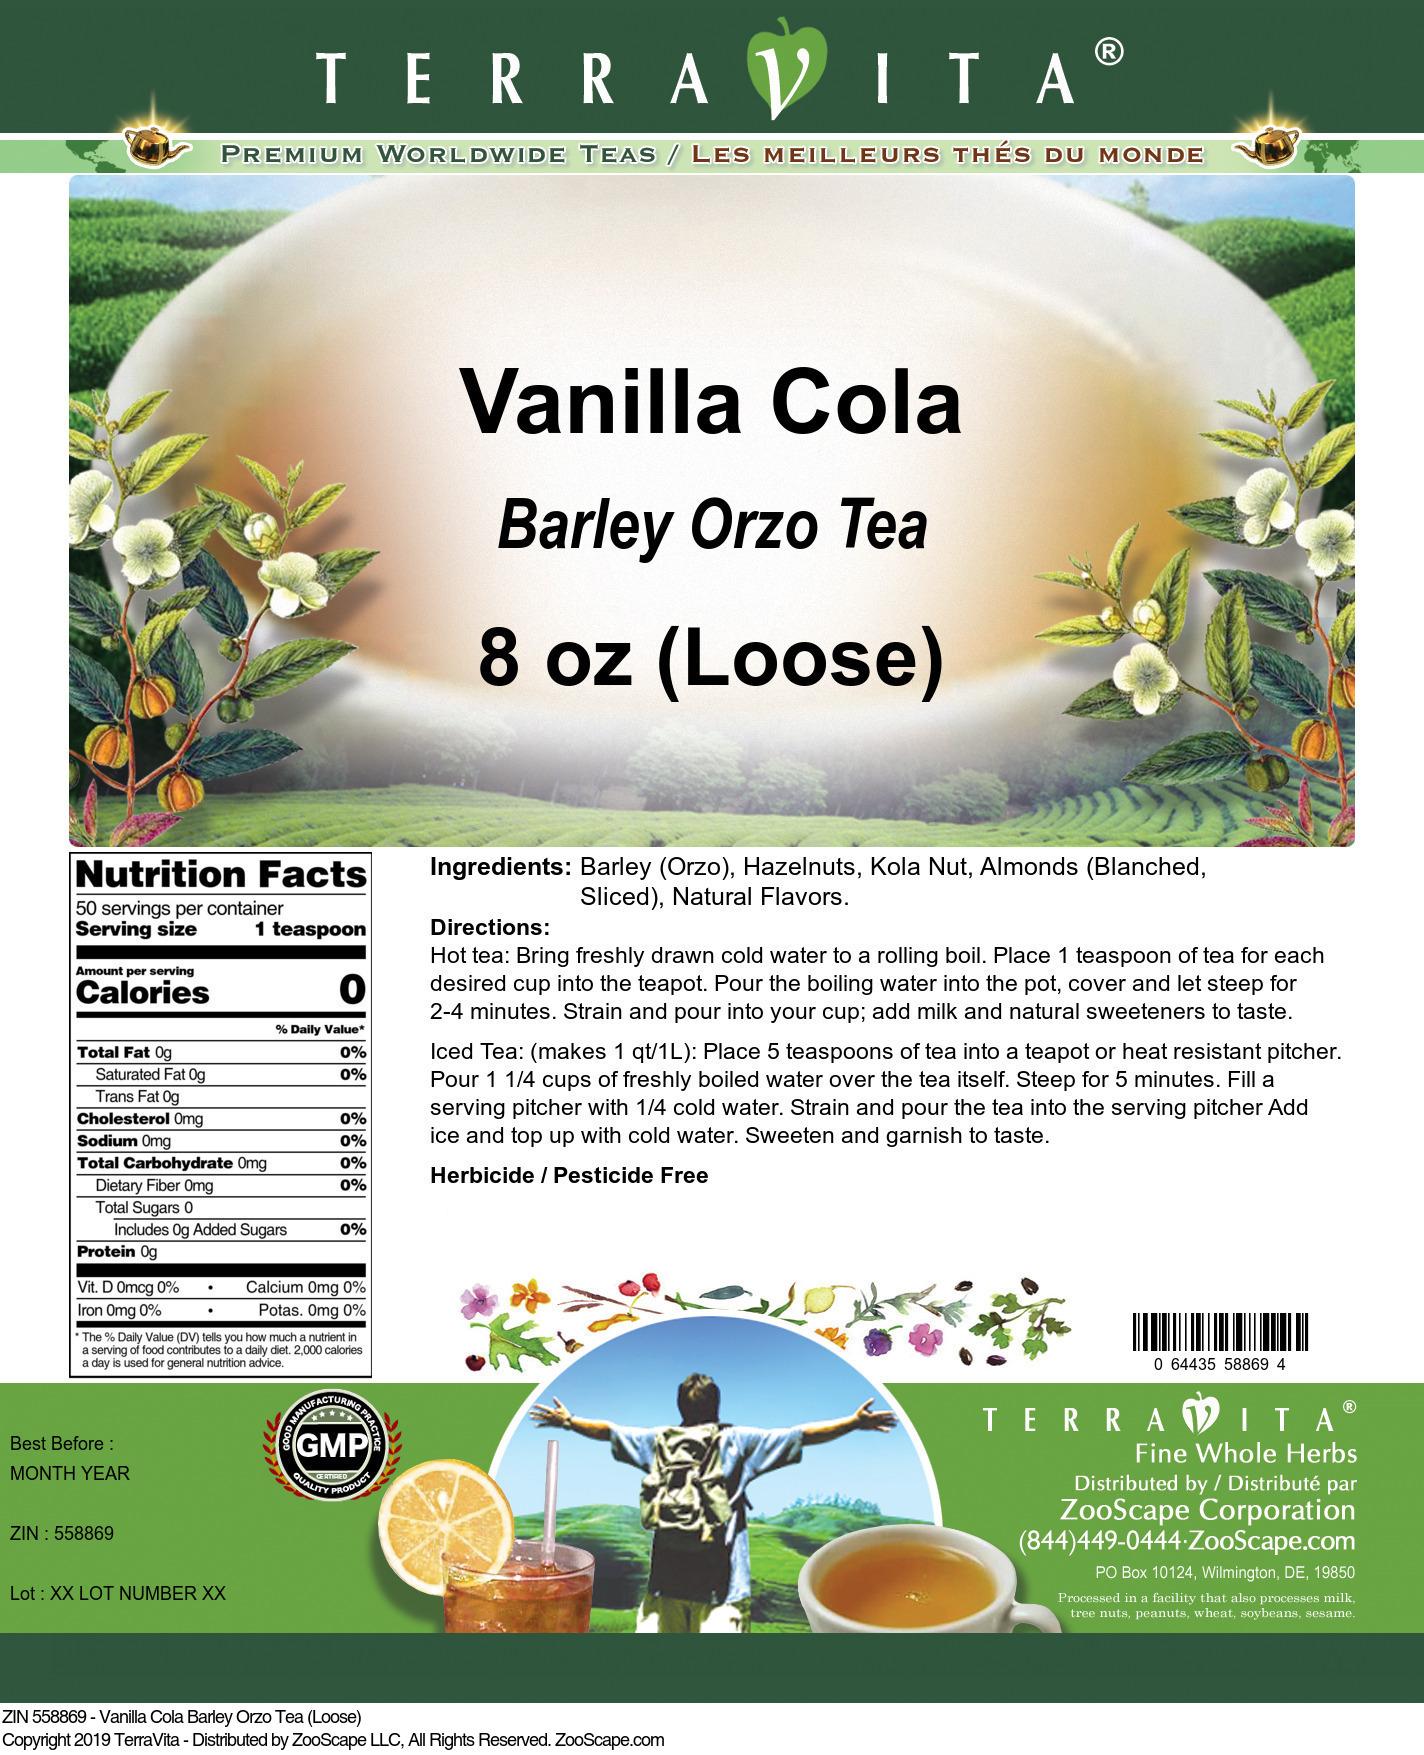 Vanilla Cola Barley Orzo